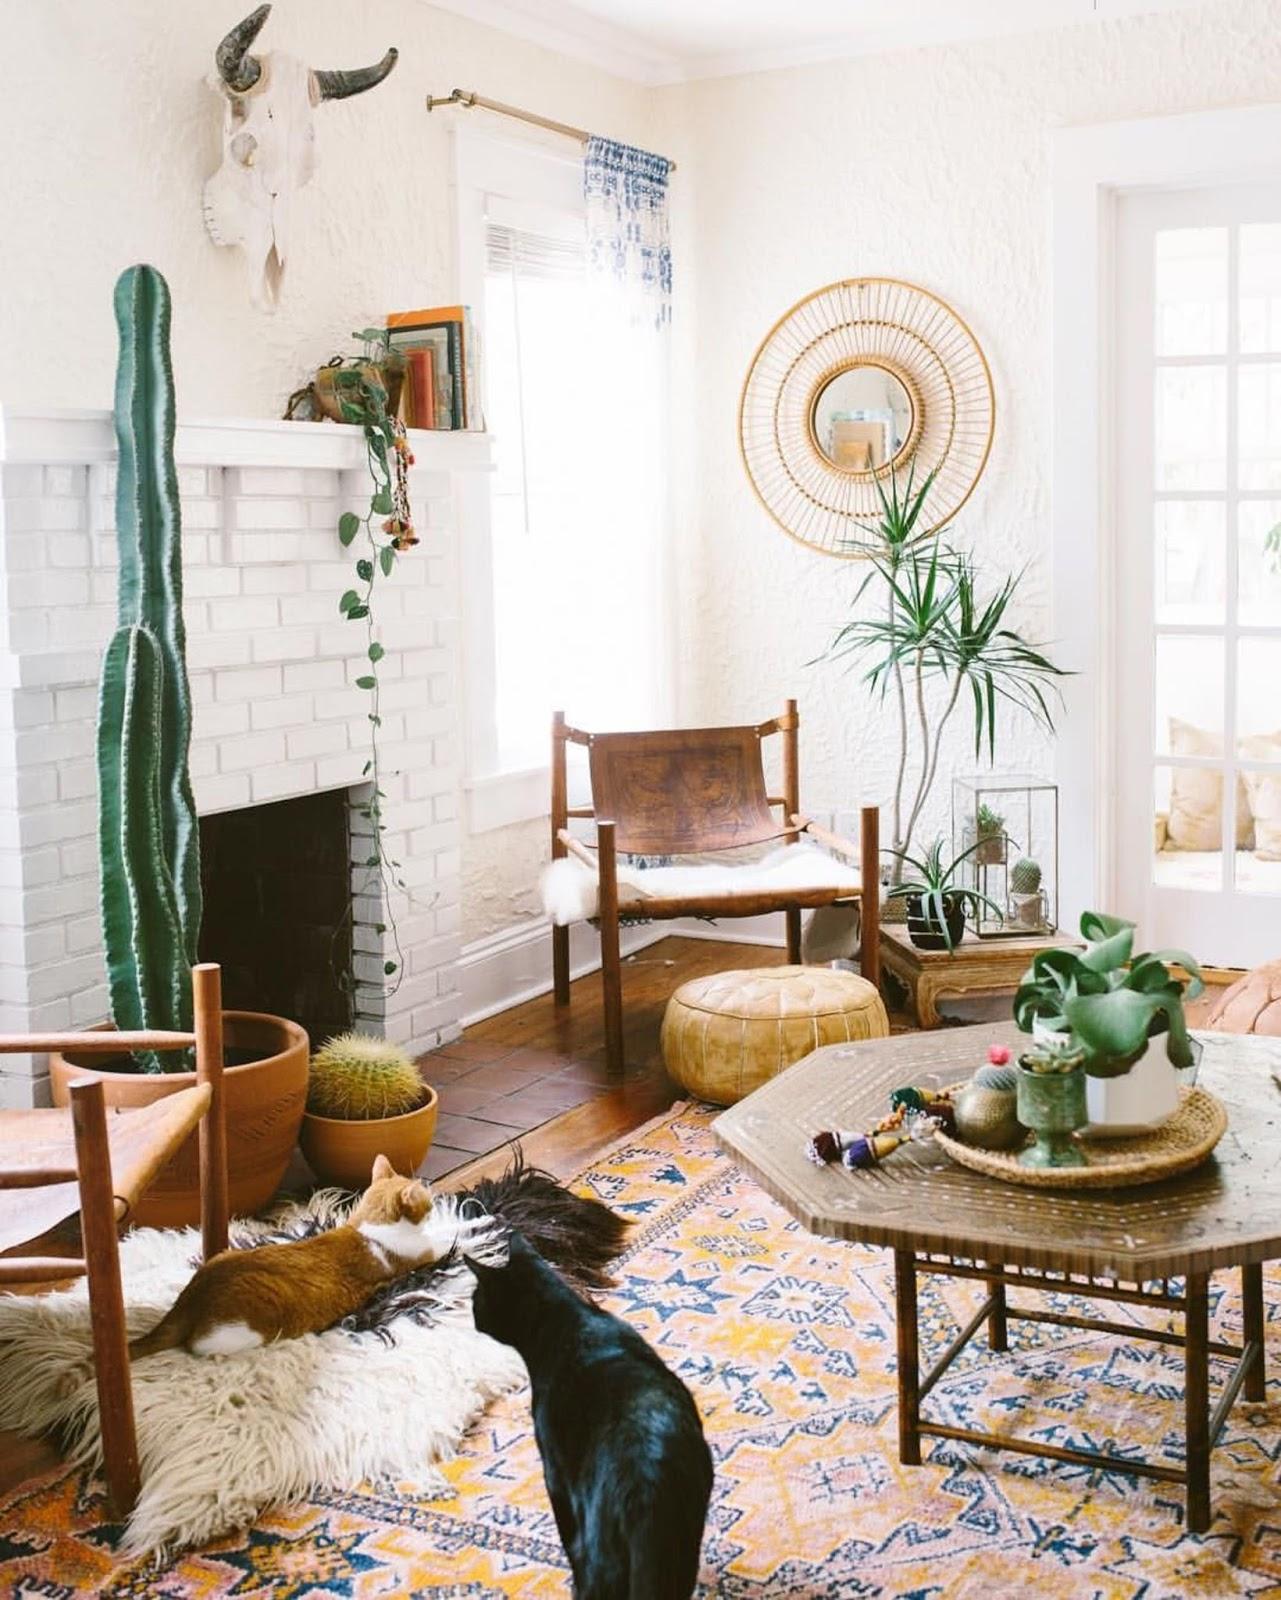 10 Beautiful Boho Chic Interiors | Design Fixation